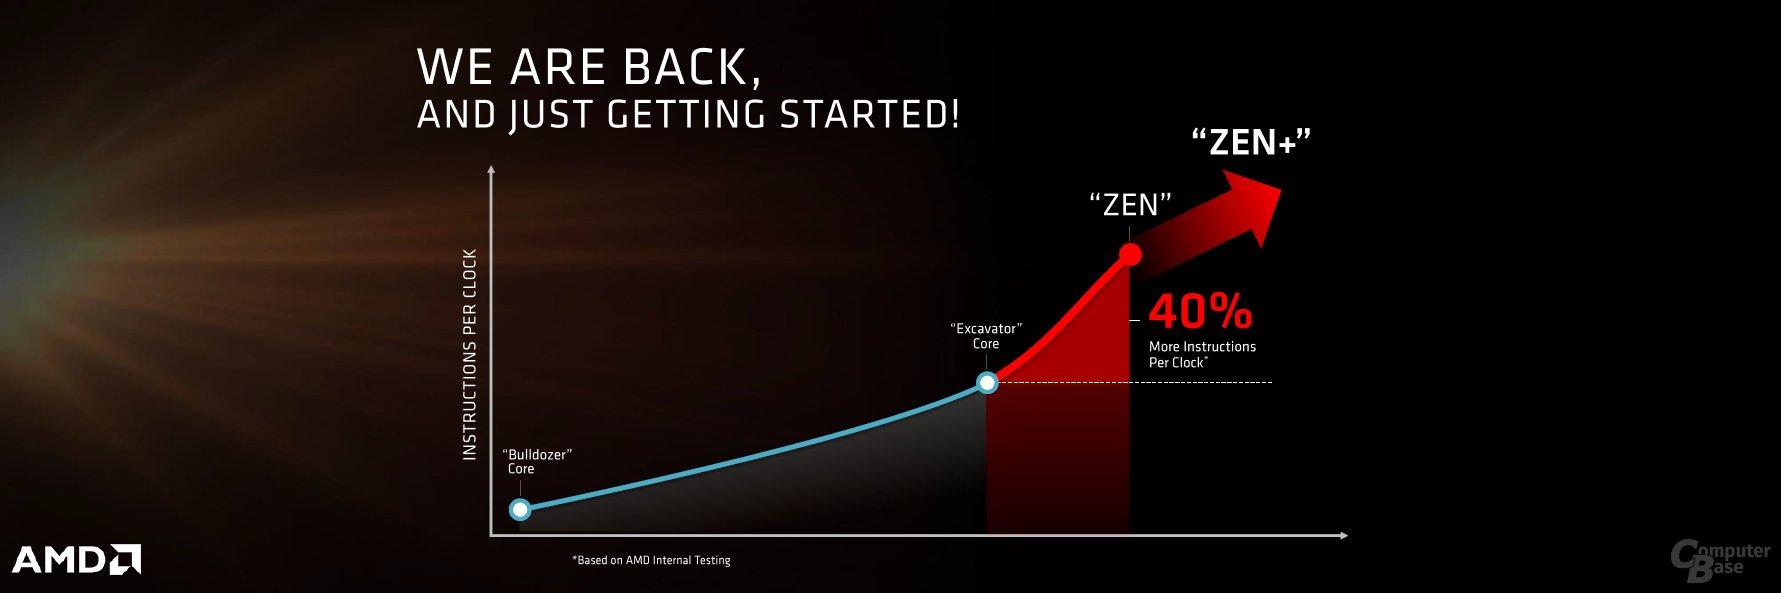 AMD-Roadmap mit Zen+